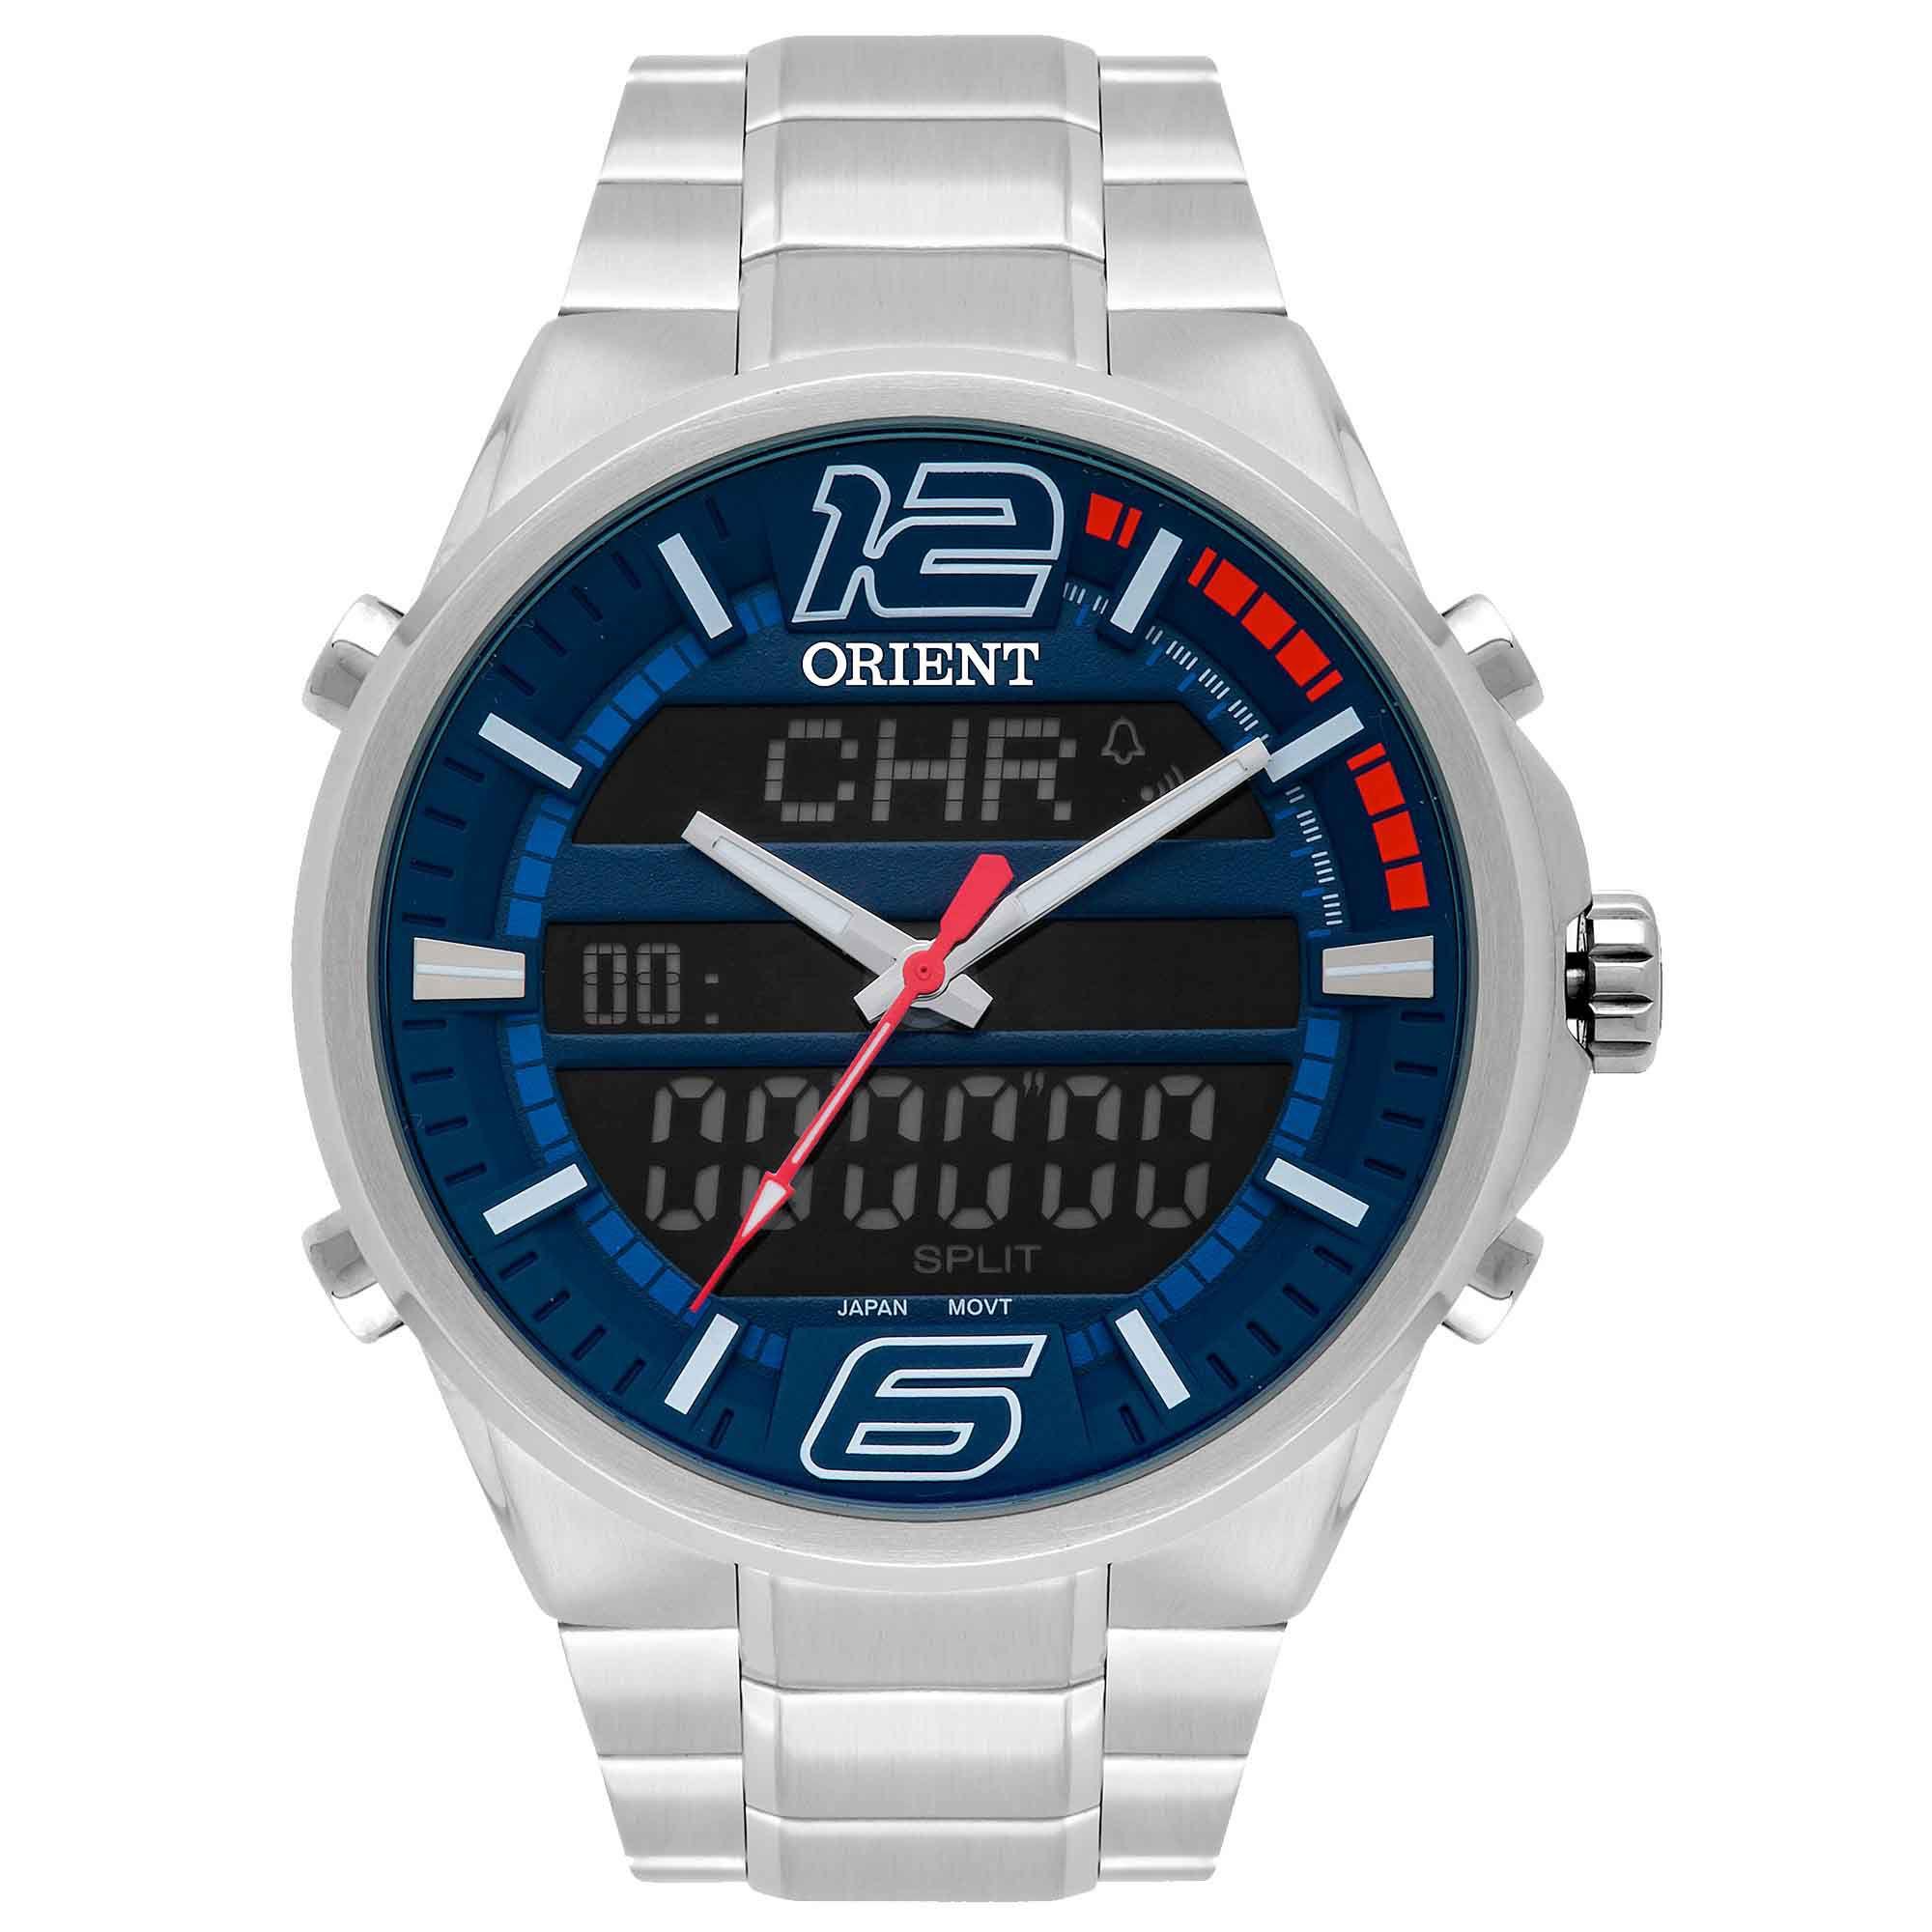 Relógio Masculino Orient MBSSA047 DVSX